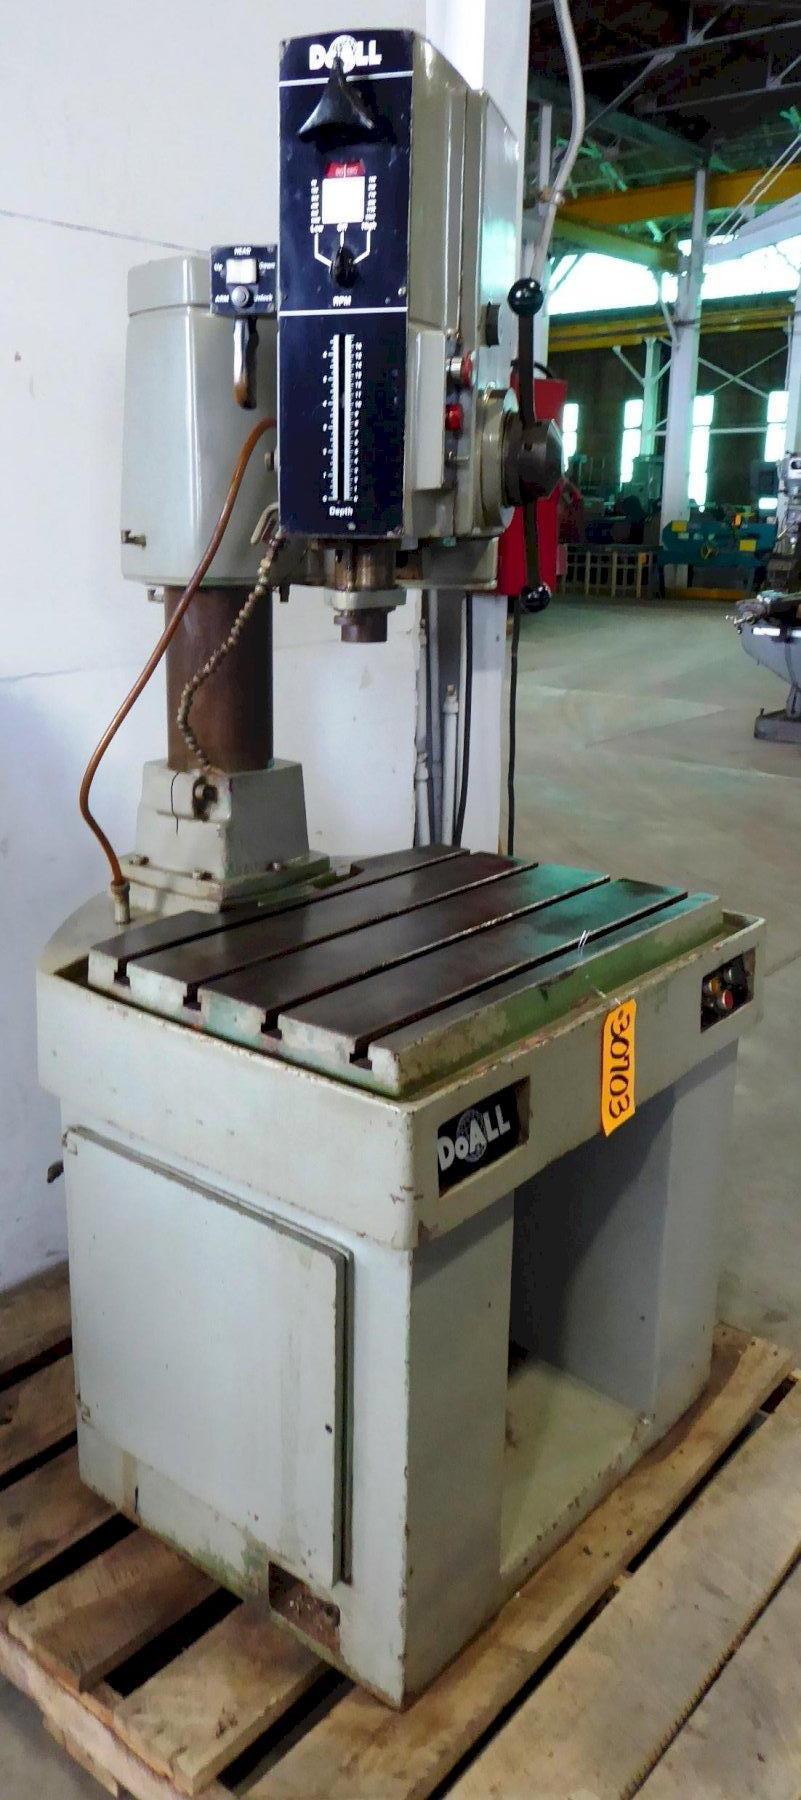 DoAll Radial Drill Model DTR-28